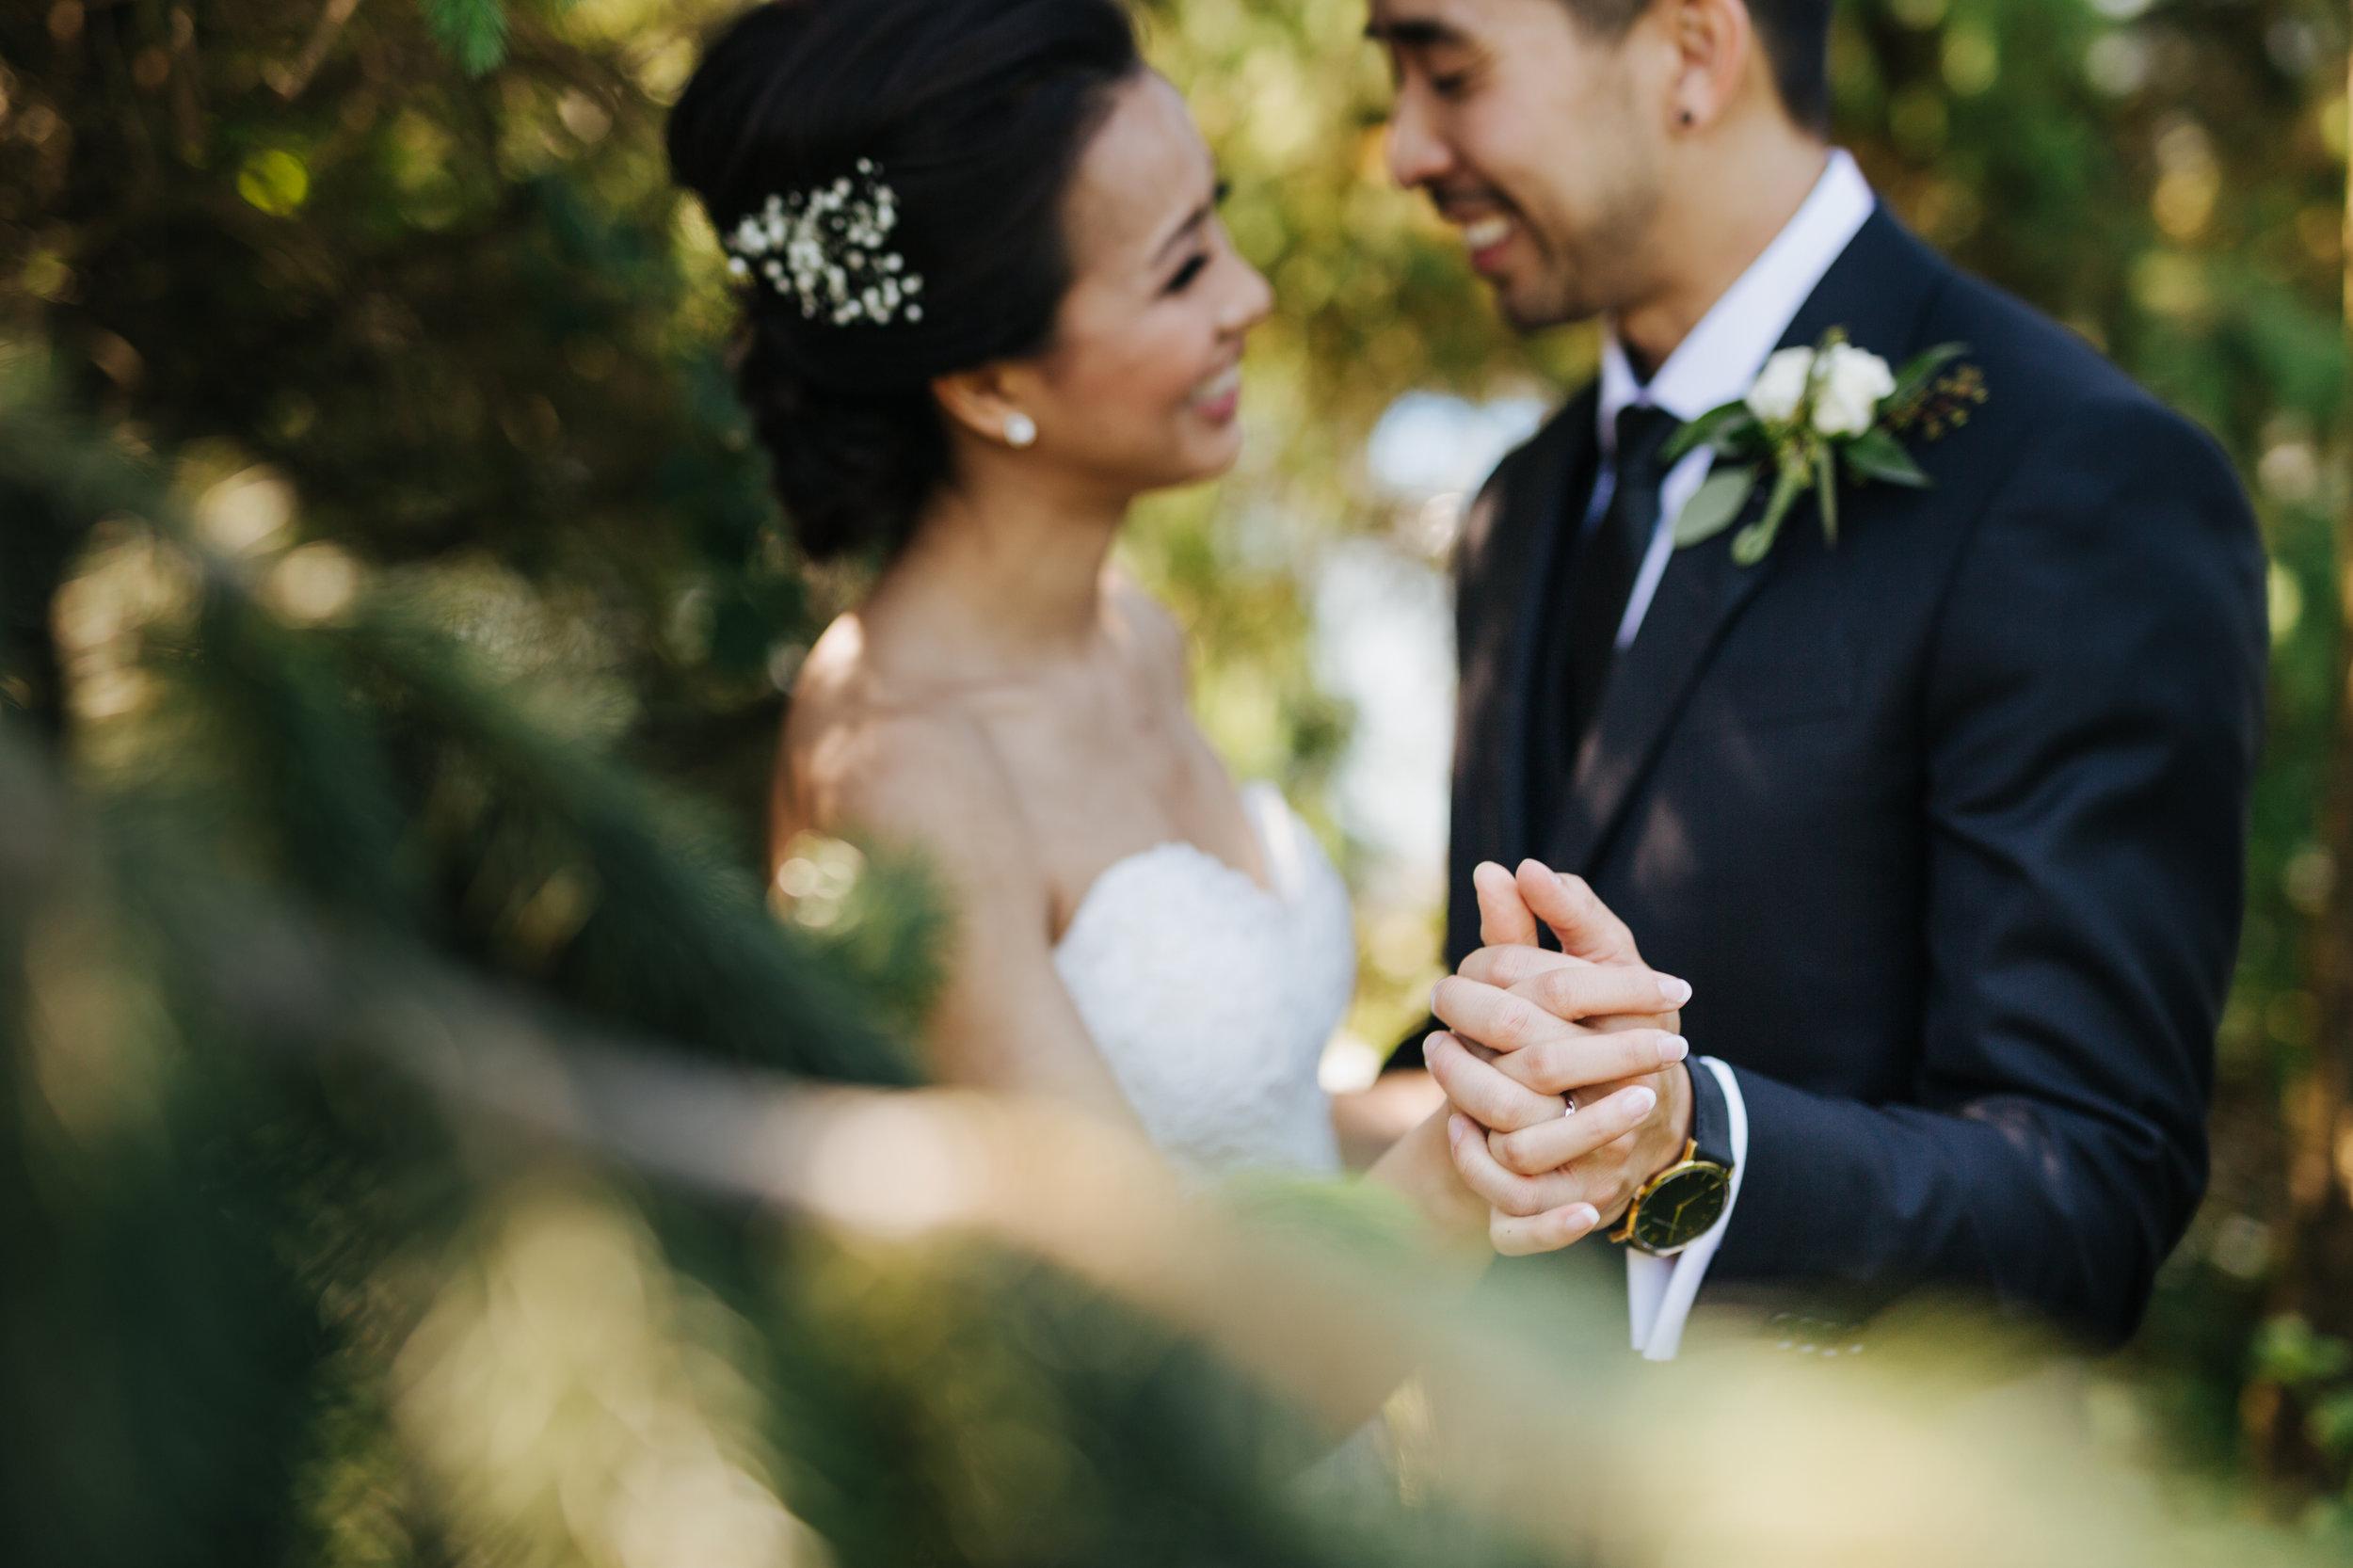 herafilms_wedding_lisa_arthur_hera_selects-66.jpg